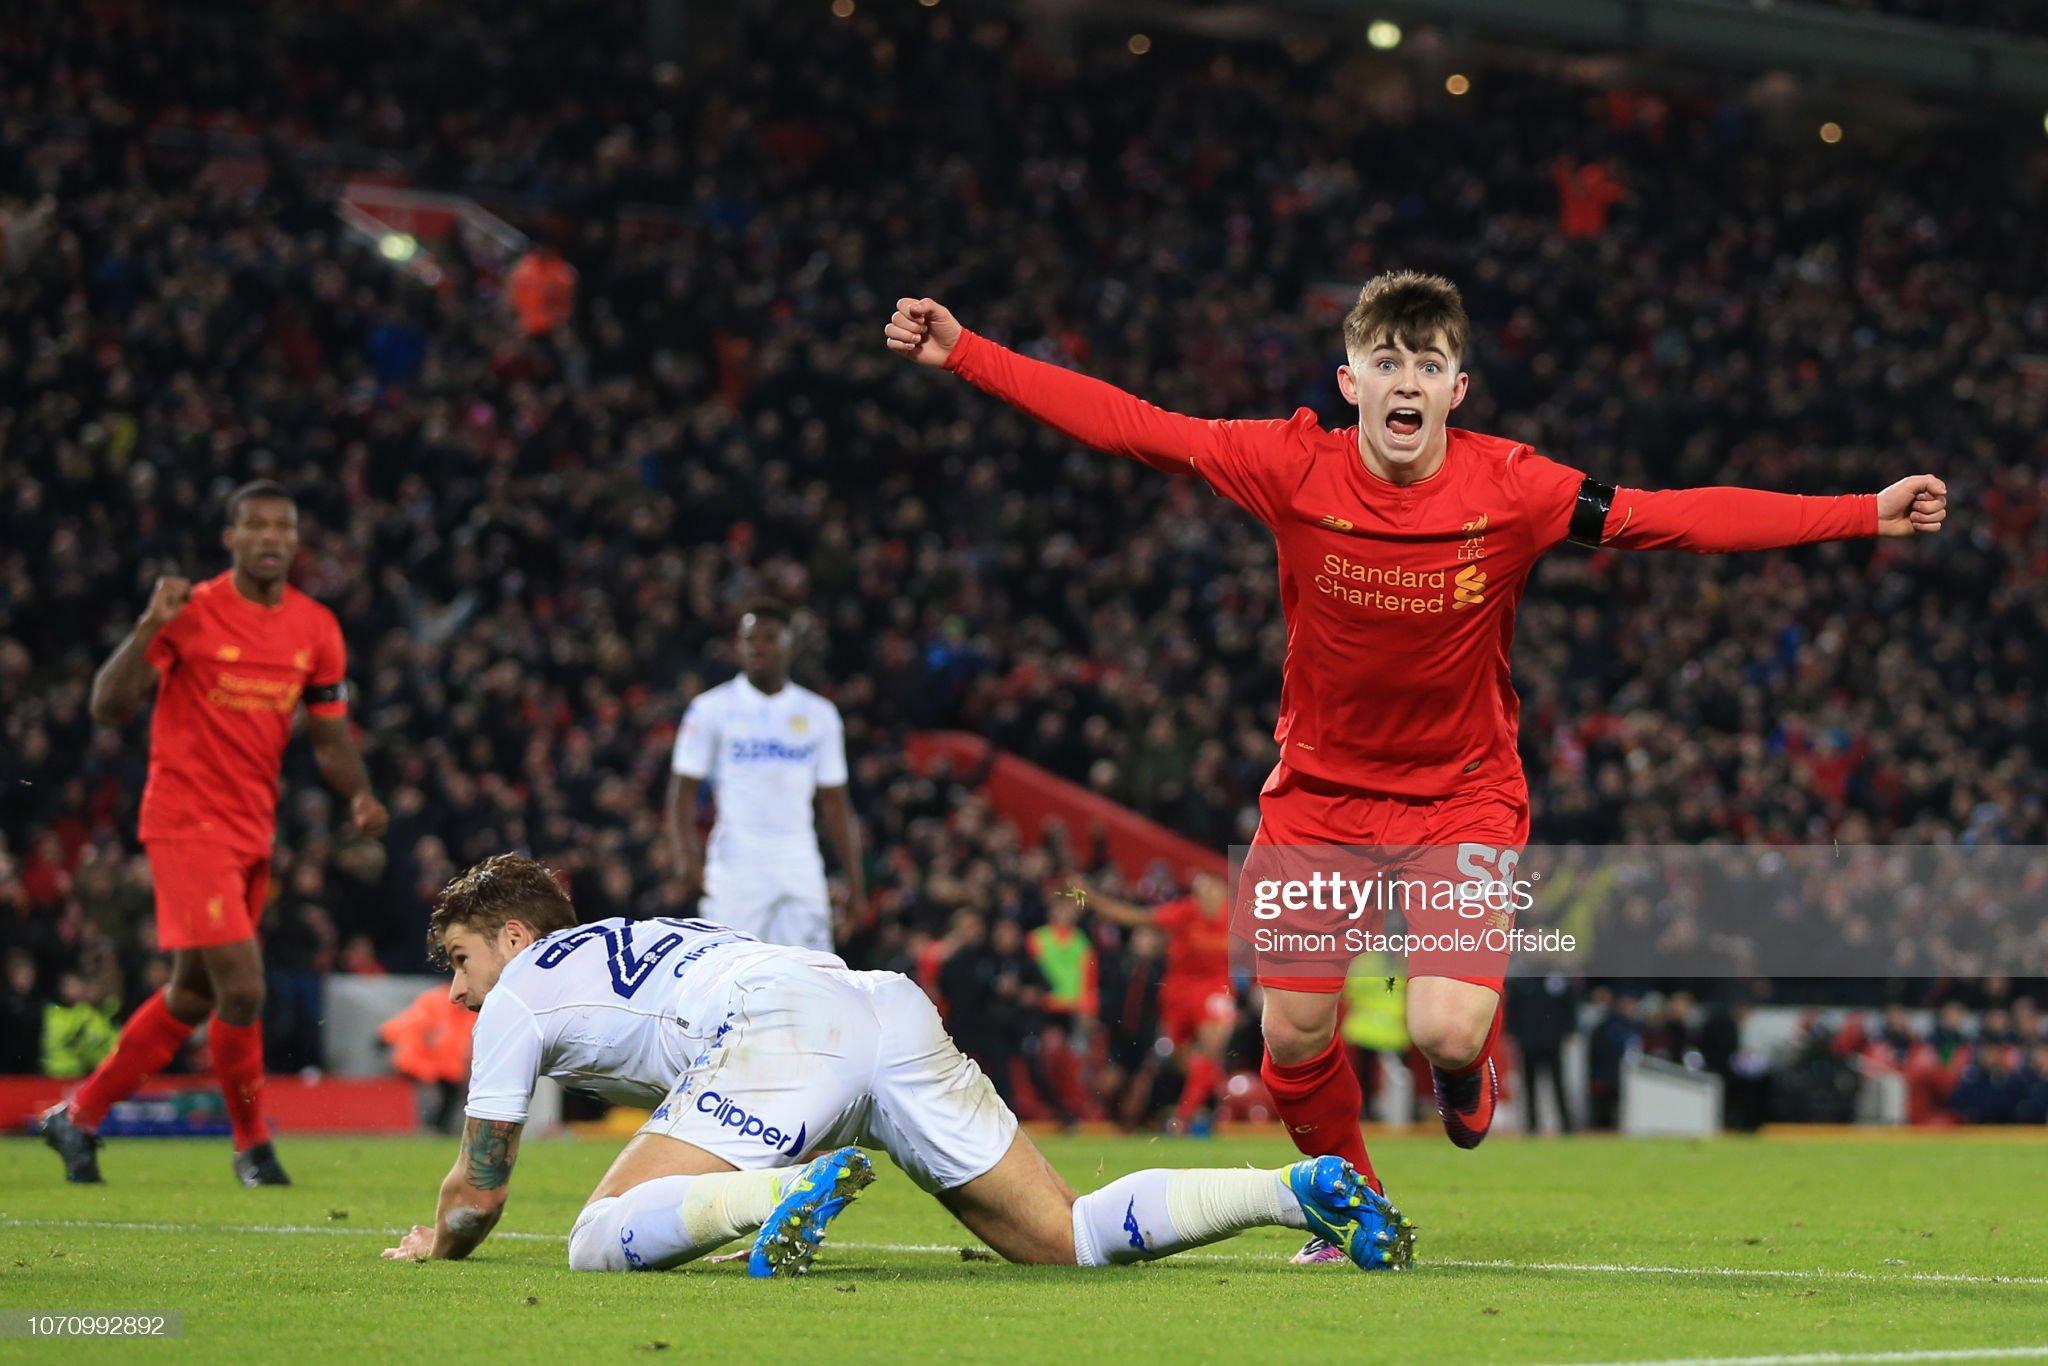 Football - EFL Cup (Quarter-Final) - Liverpool v Leeds United : News Photo